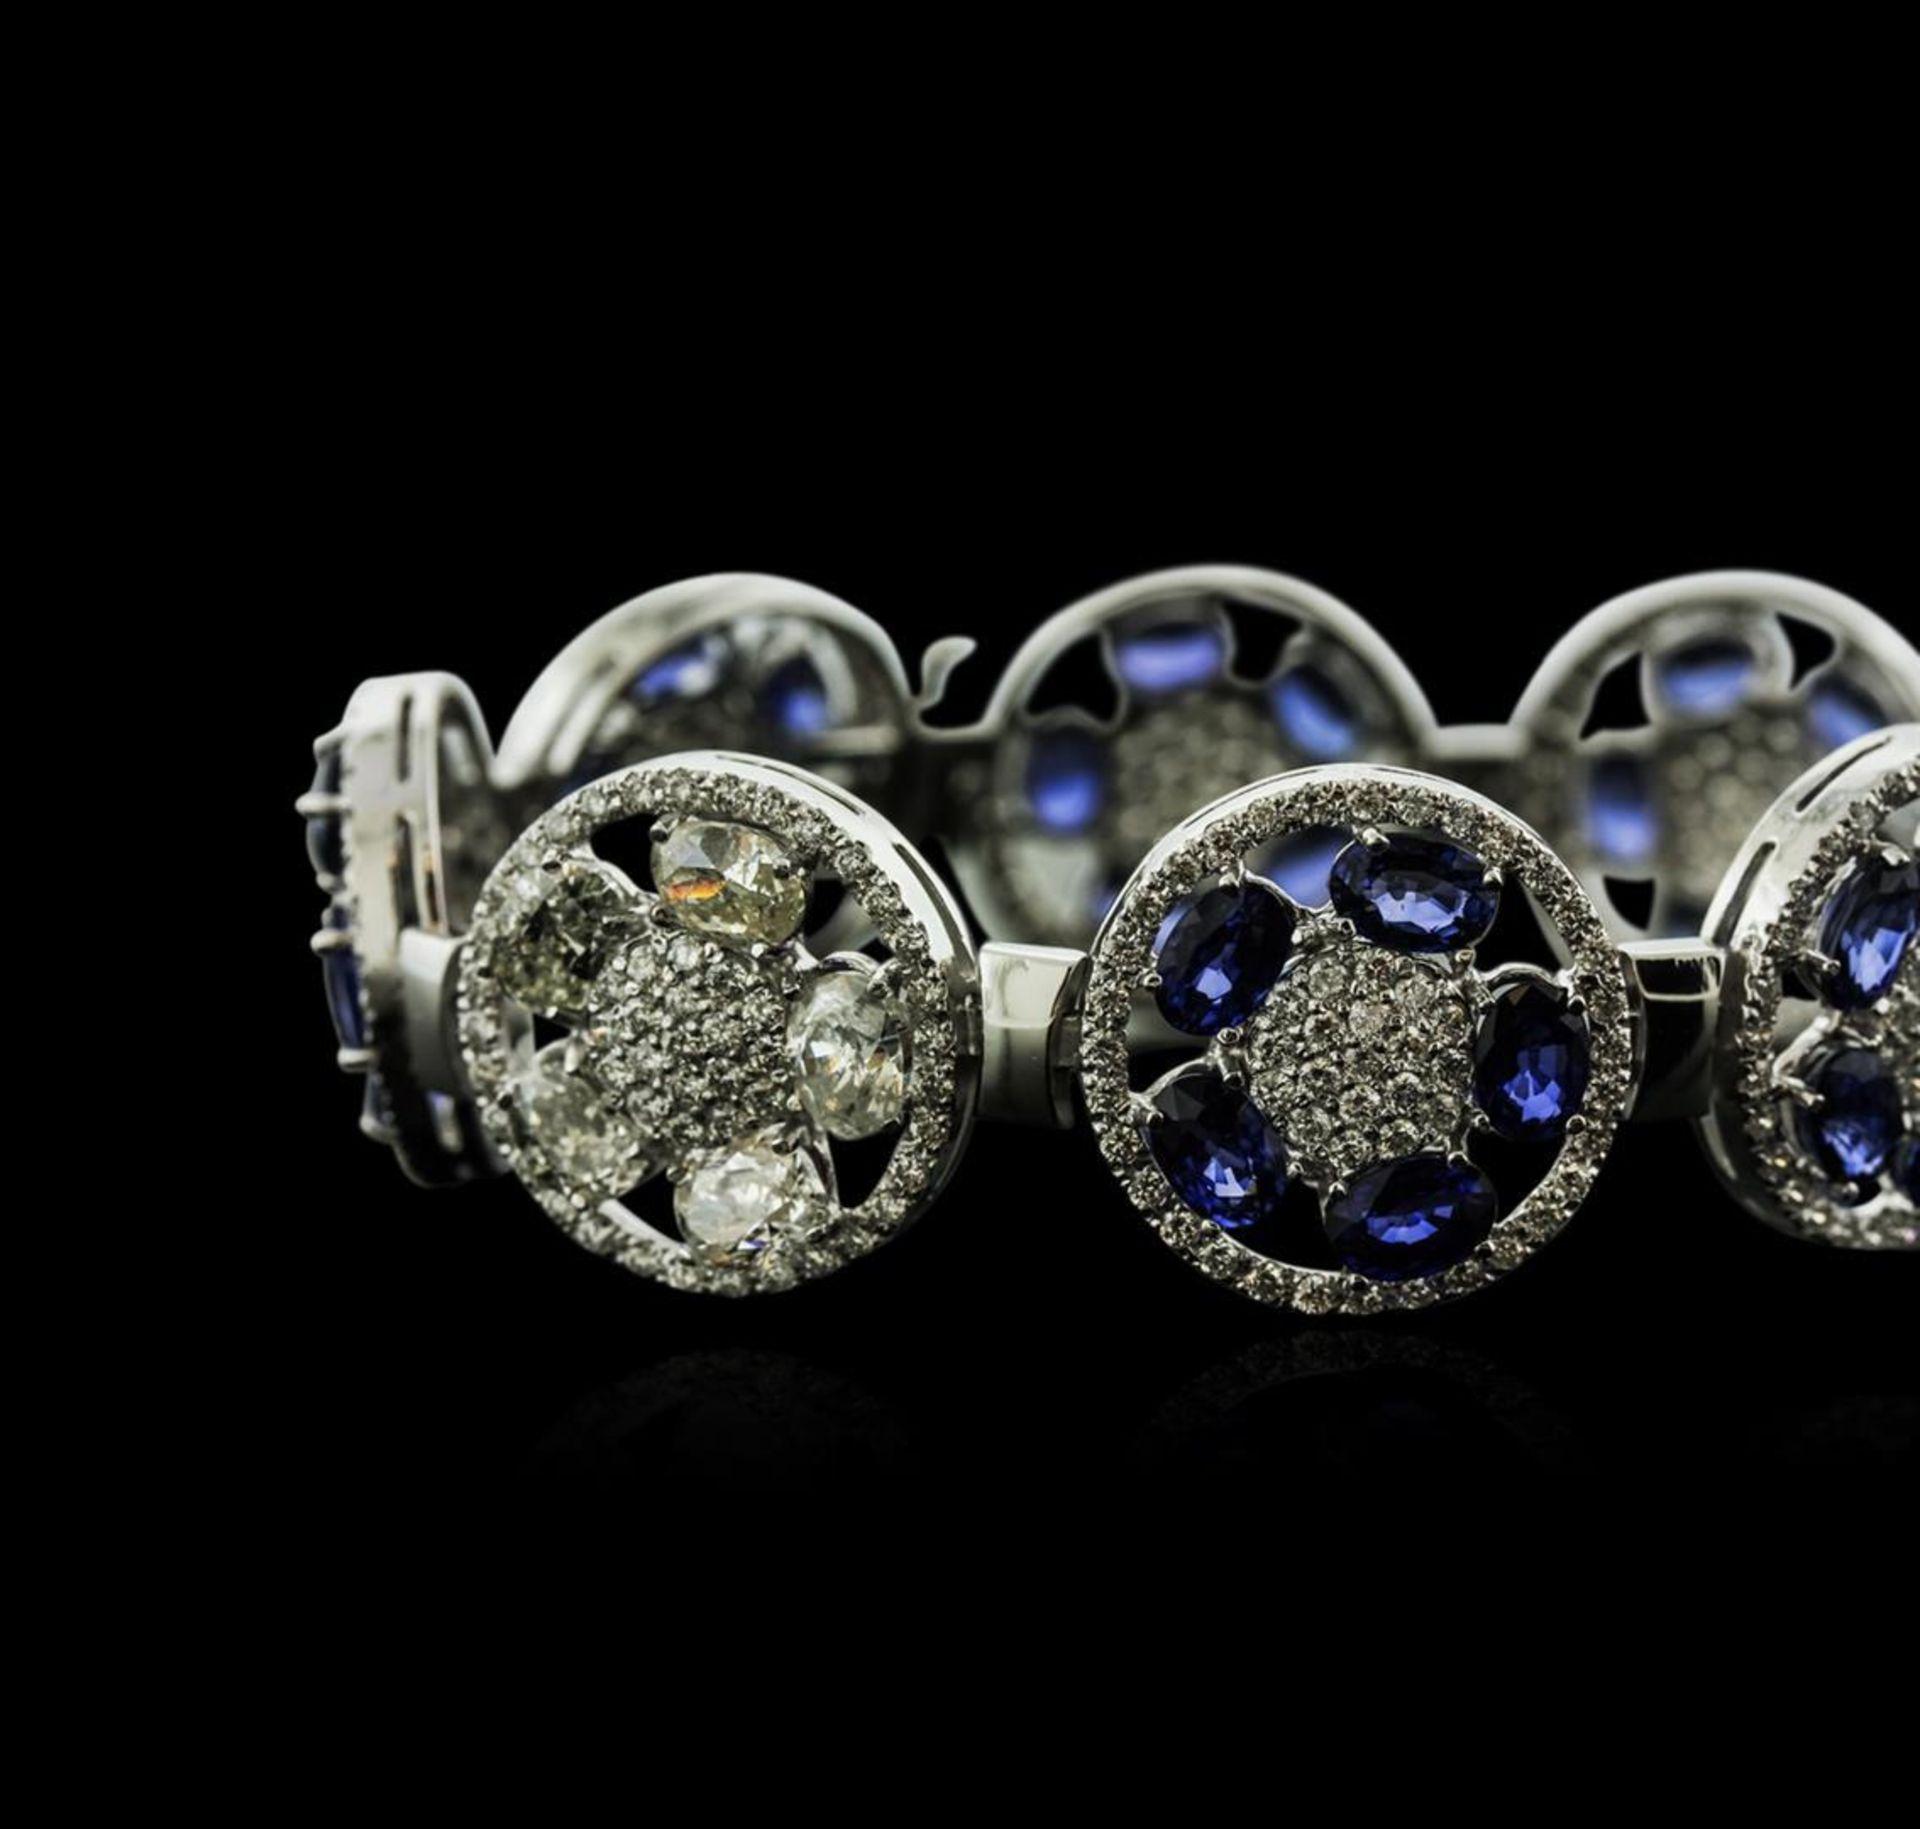 14KT White Gold 21.00 ctw Sapphire and Diamond Bracelet - Image 2 of 4